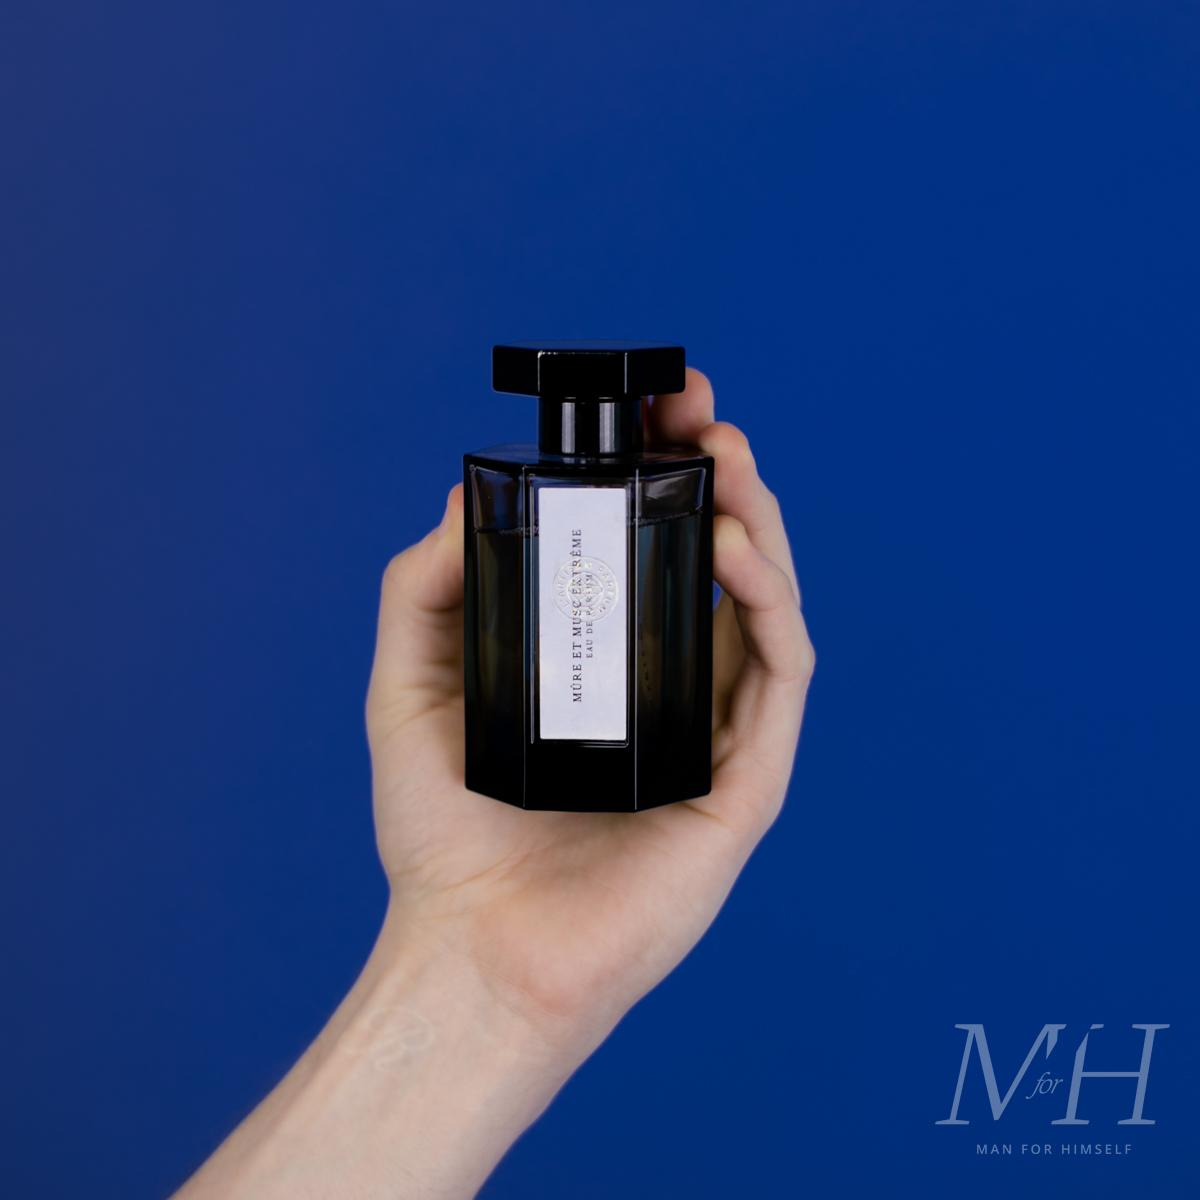 lartisan-parfumeur-mure-et-musc-extreme-review-man-for-himself